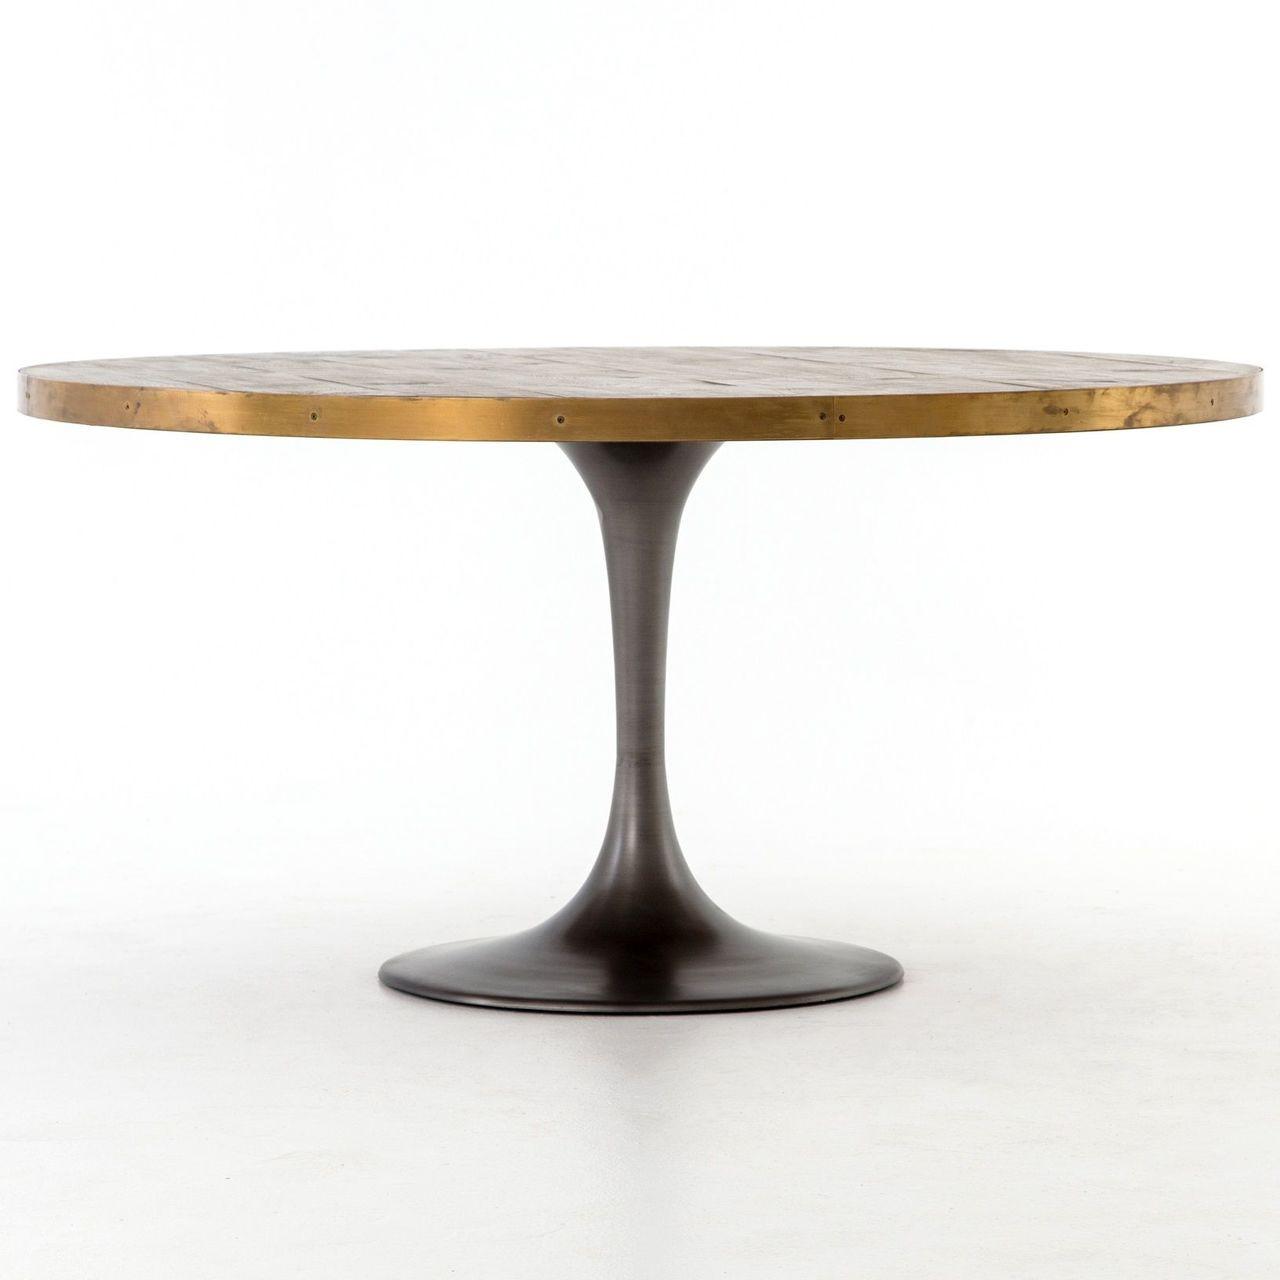 evans industrial tulip oak wood top round dining table 60